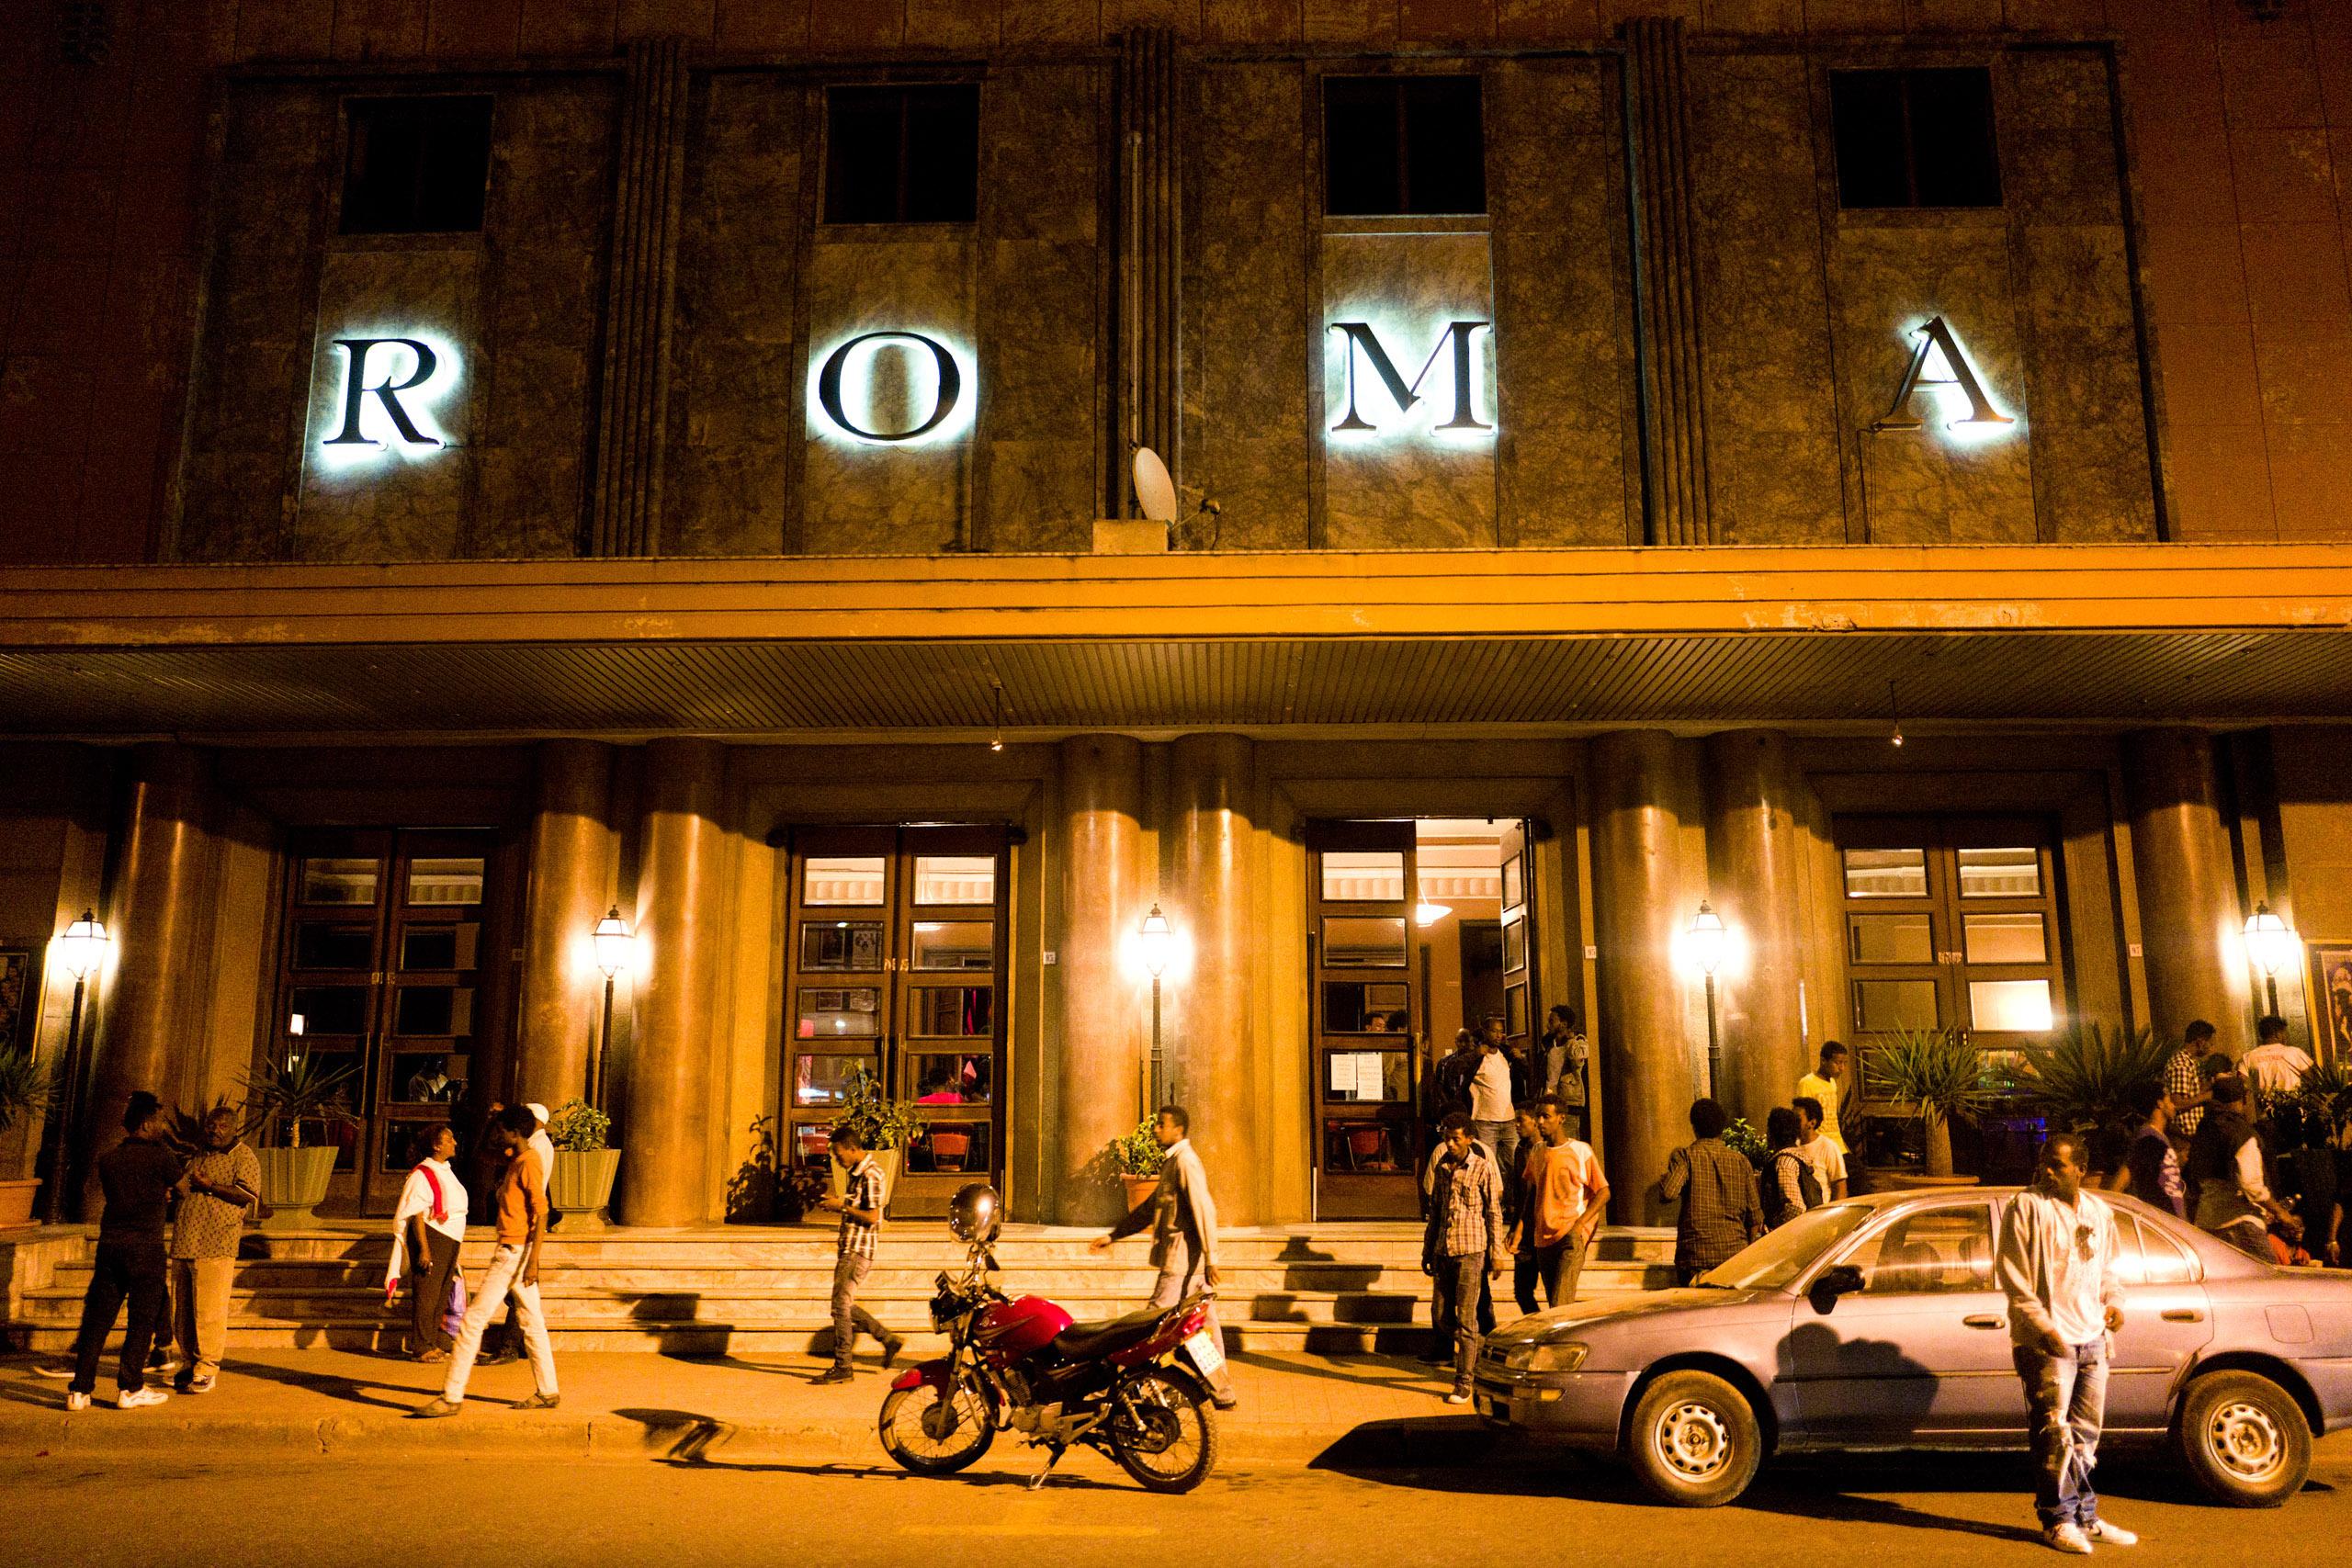 Exterior of the Cinema Roma, in Asmara.